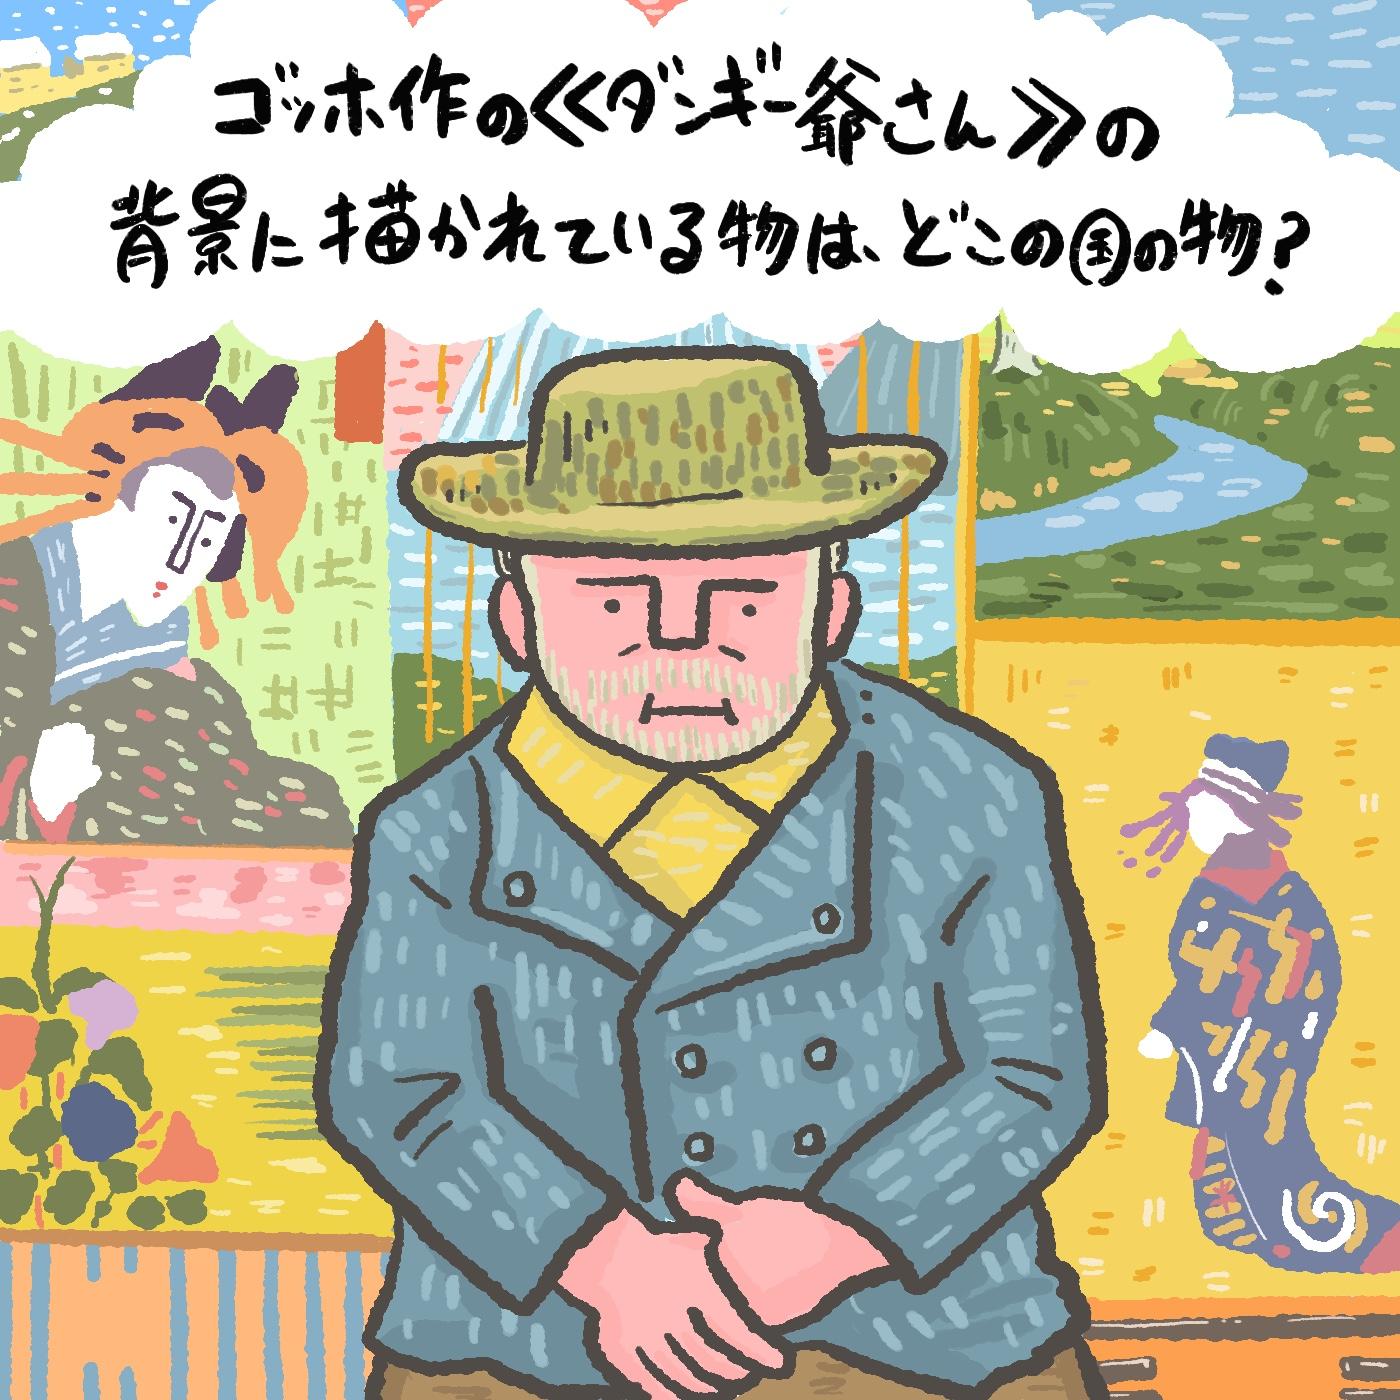 OBIKAKE ナニソレ ゴッホ タンギー爺さん 浮世絵